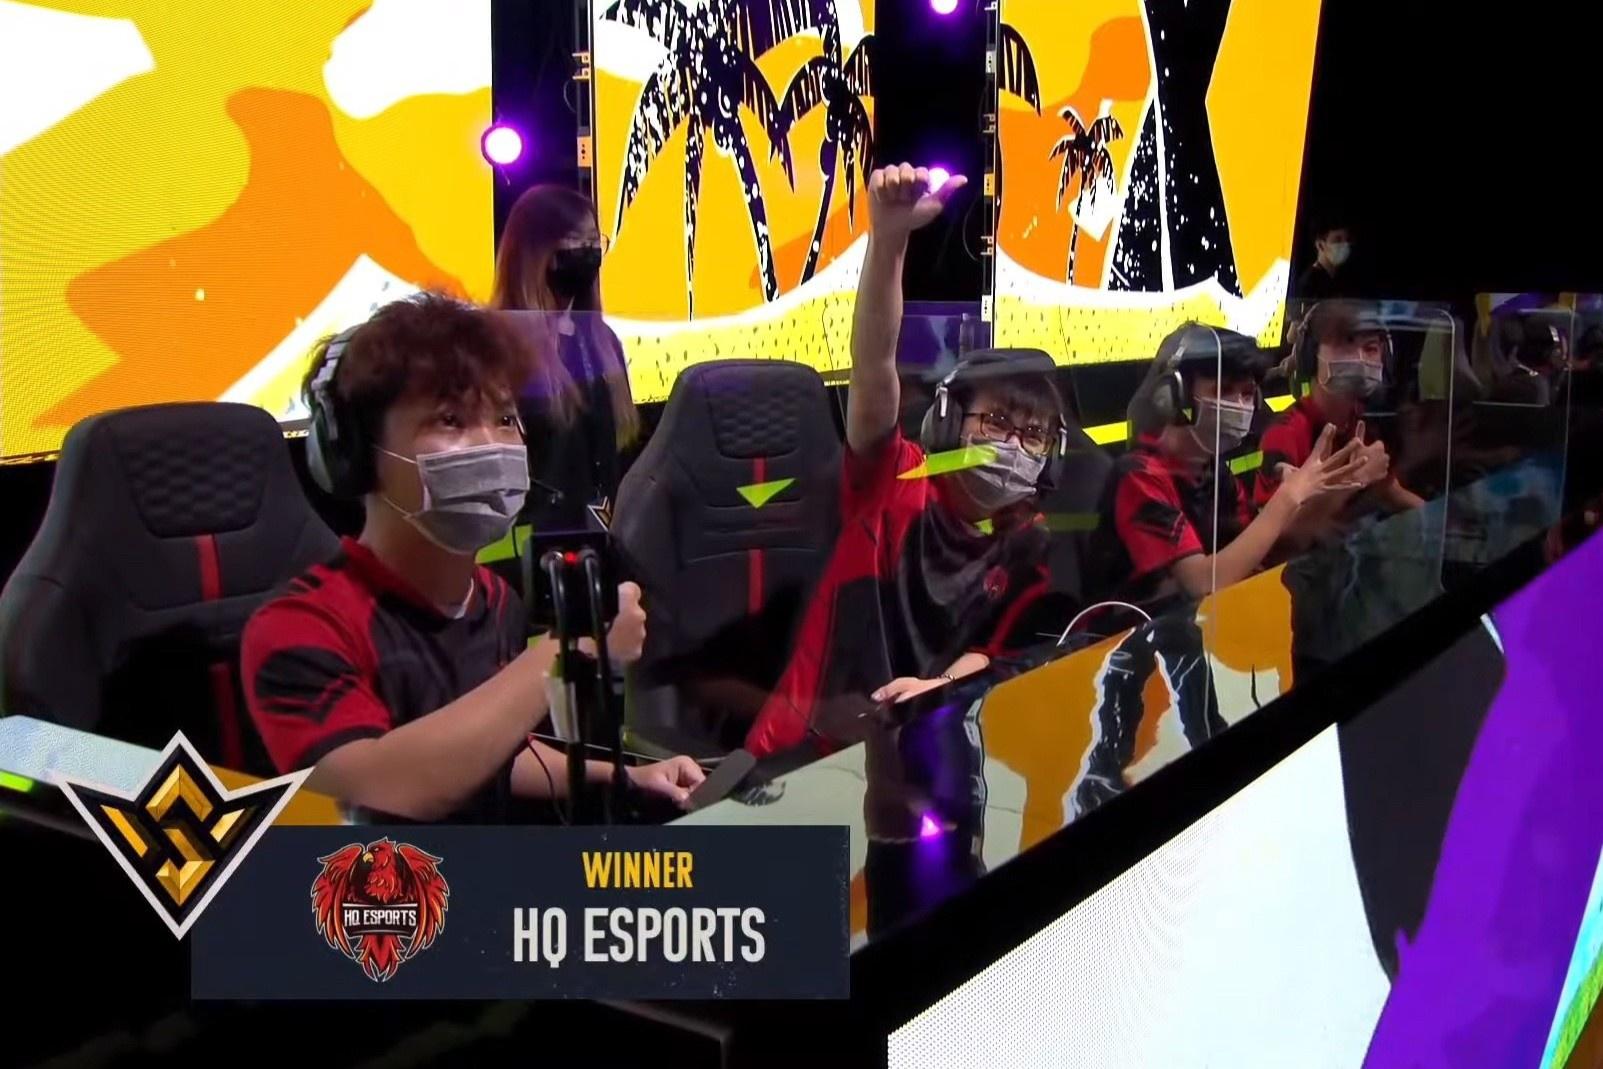 HQ Esports vào top 5 CKTG 2021 tựa game Free Fire